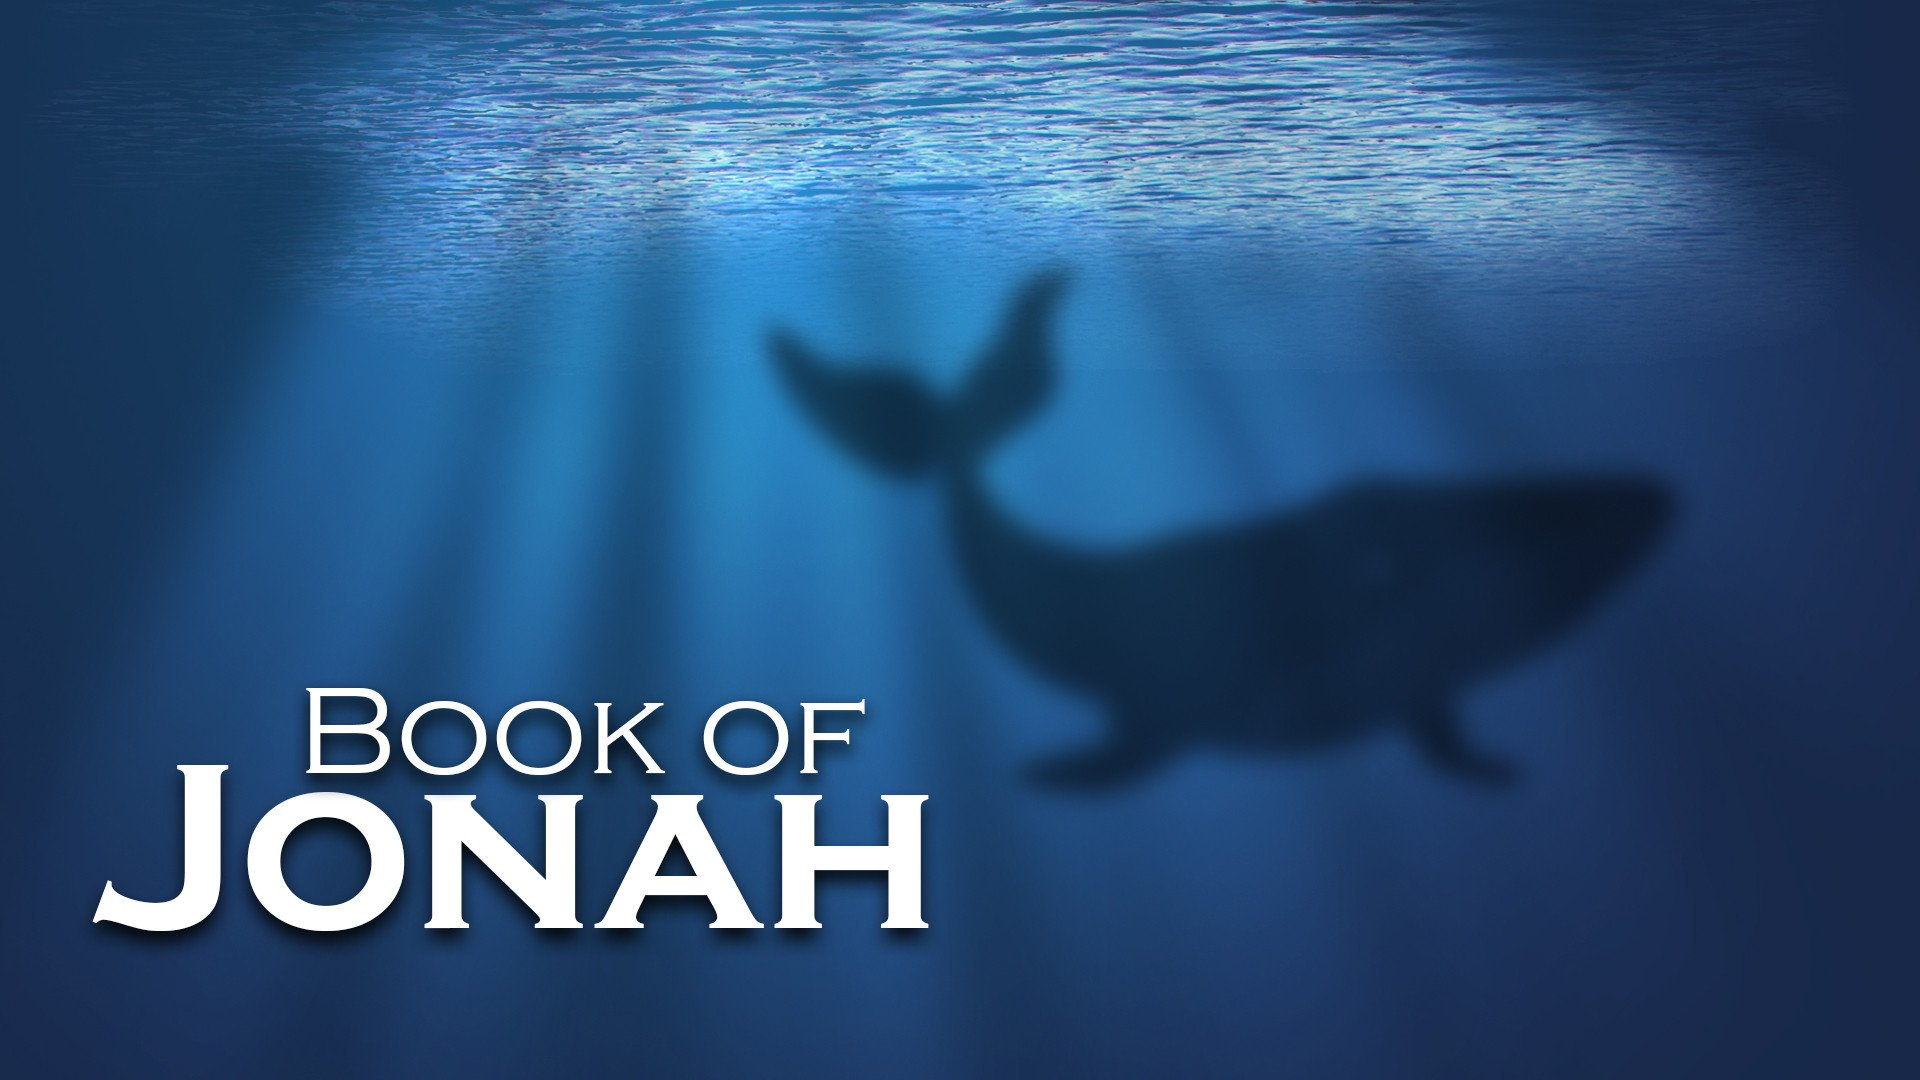 MTY_-_Book_of_Jonah_FINAL.jpg